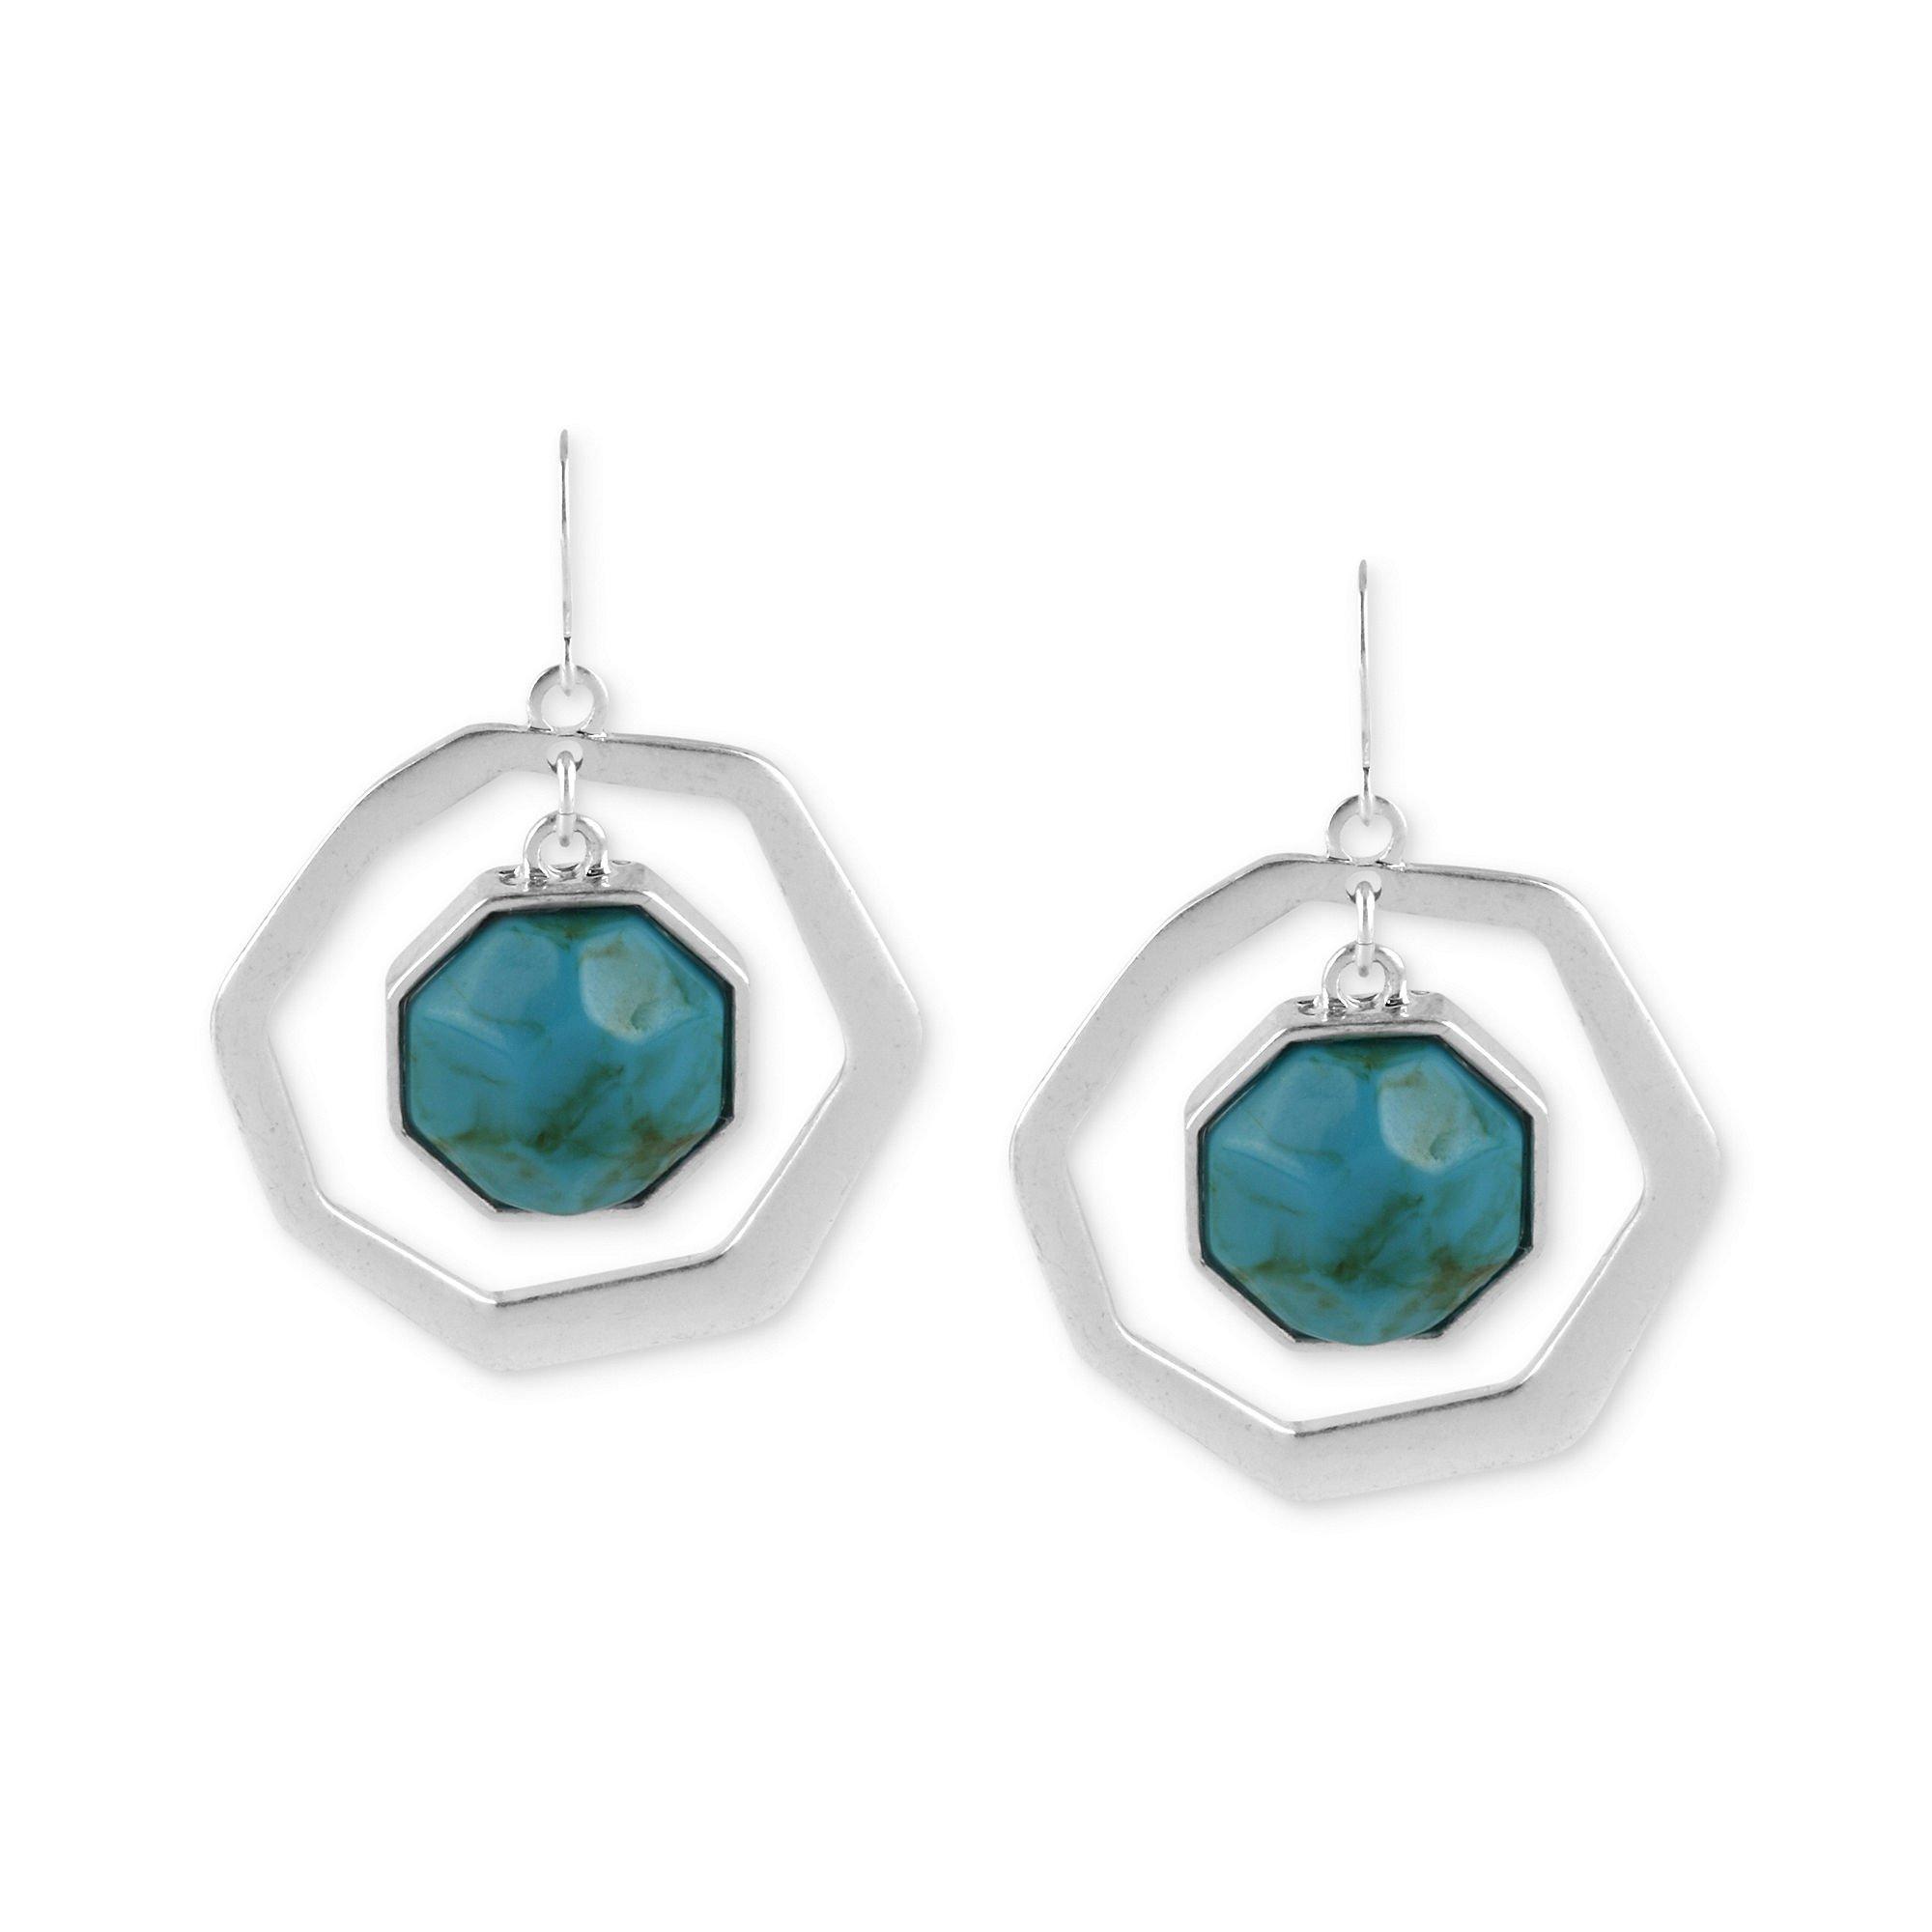 kenneth cole silvertone turquoise geometric bead orbital